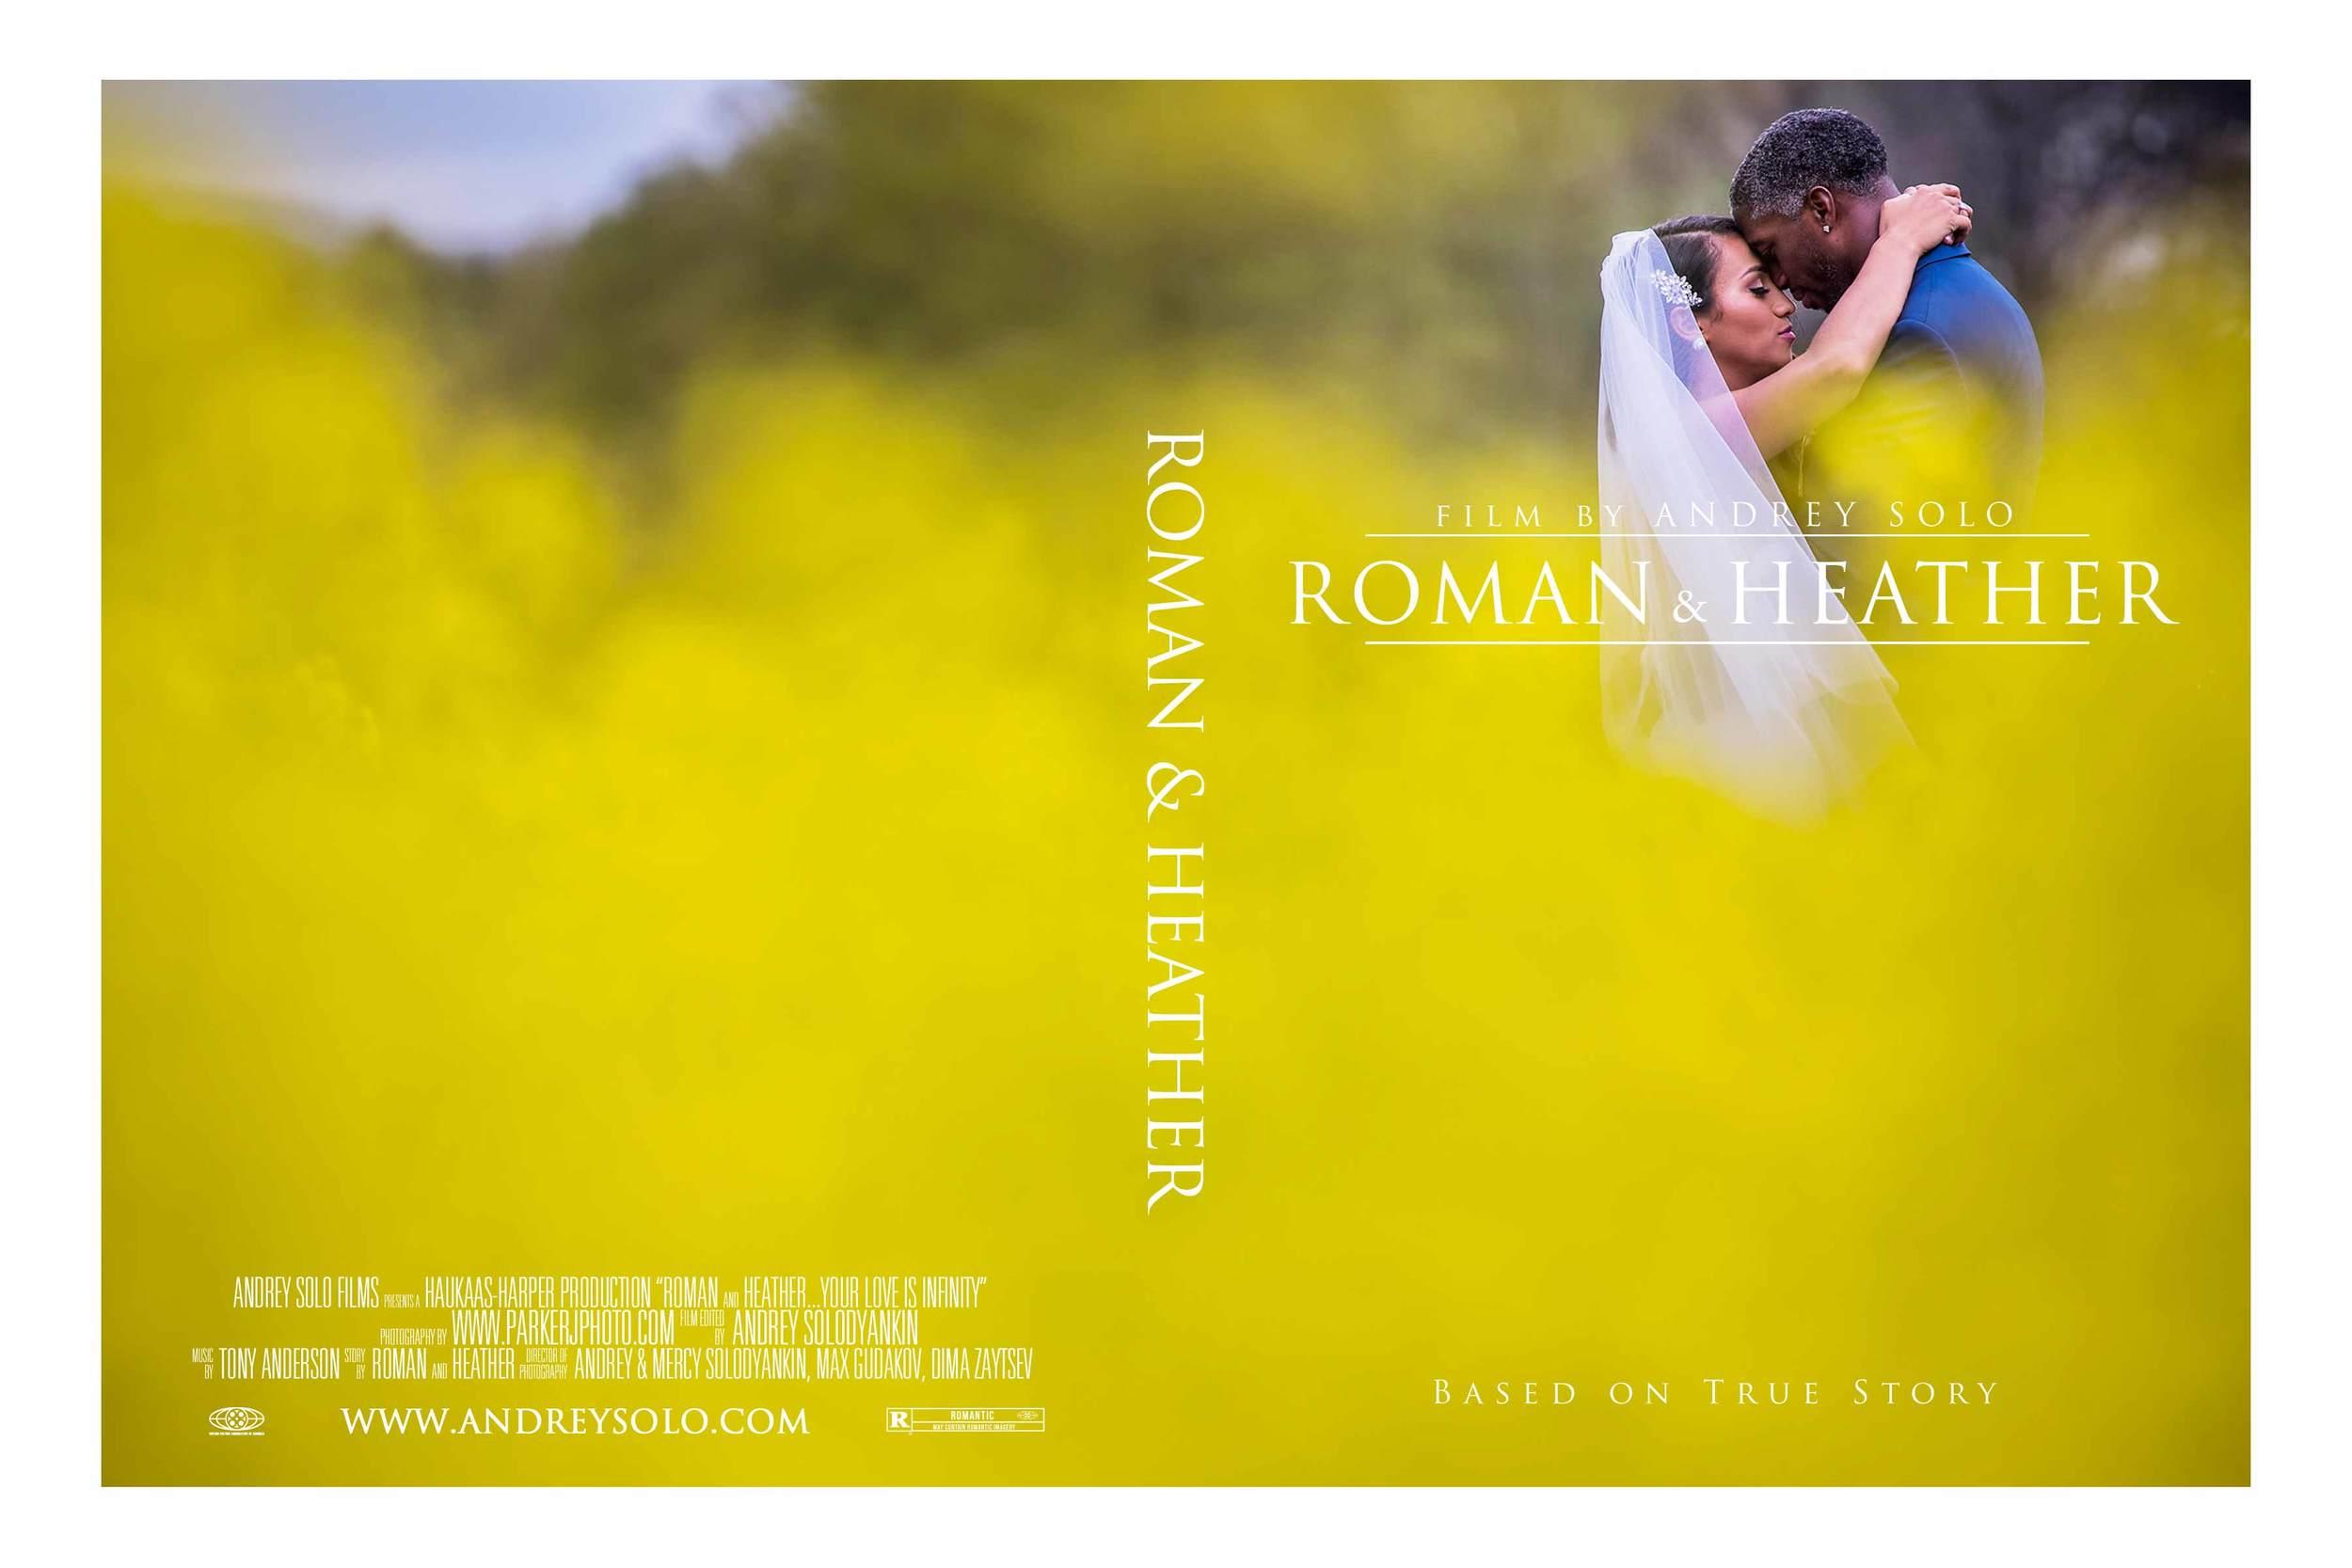 Roman-&-Heather-DVD2.jpg